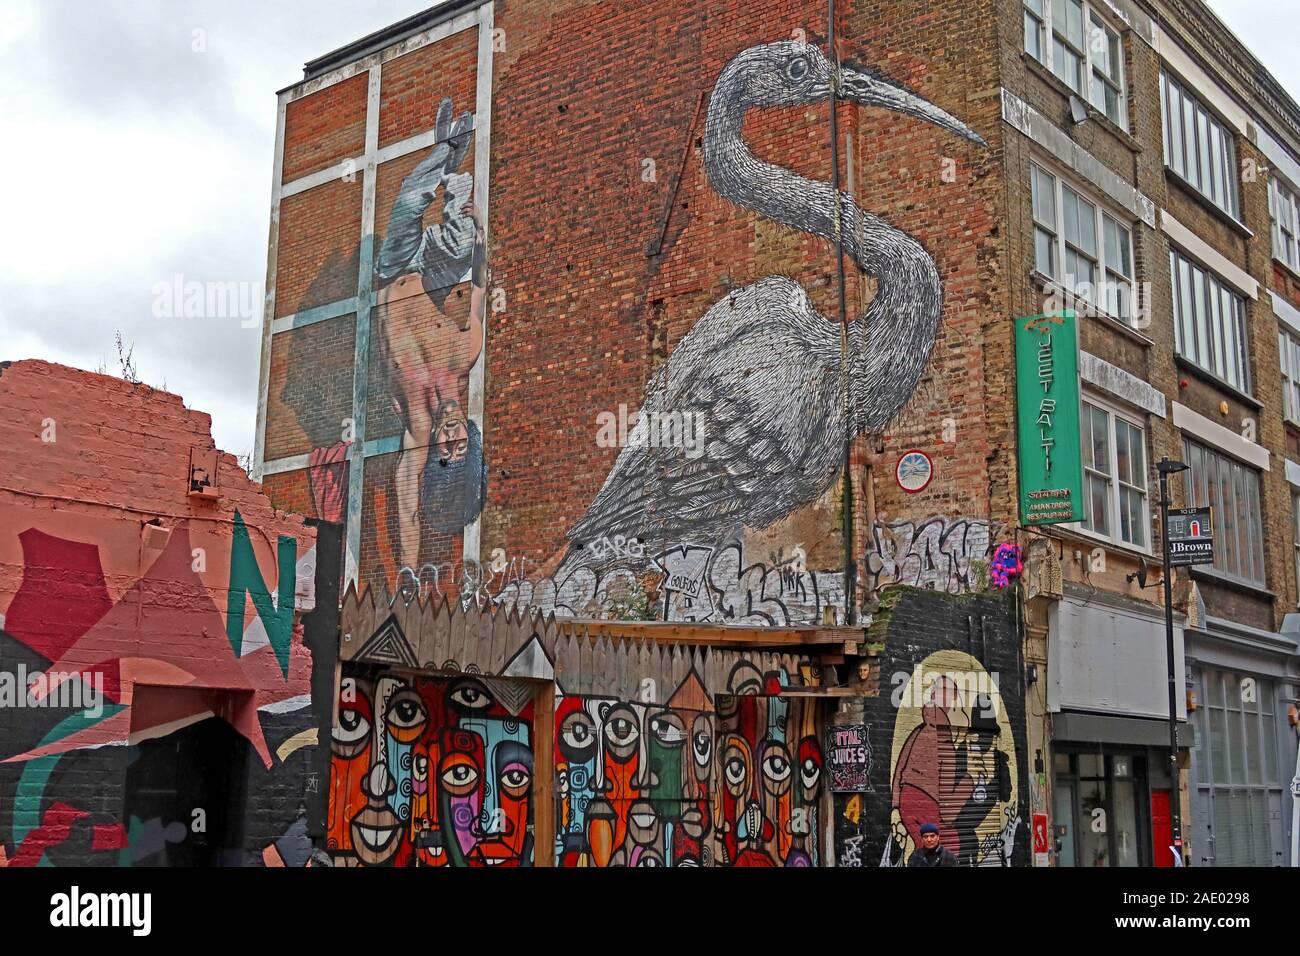 Dieses Stockfoto: Stork, Hanbury Street, Brick Lane, Kunst und Graffiti, Shoreditch, Tower Hamlets, East End, London, South East, England, Großbritannien, E1 6QL - 2AE029